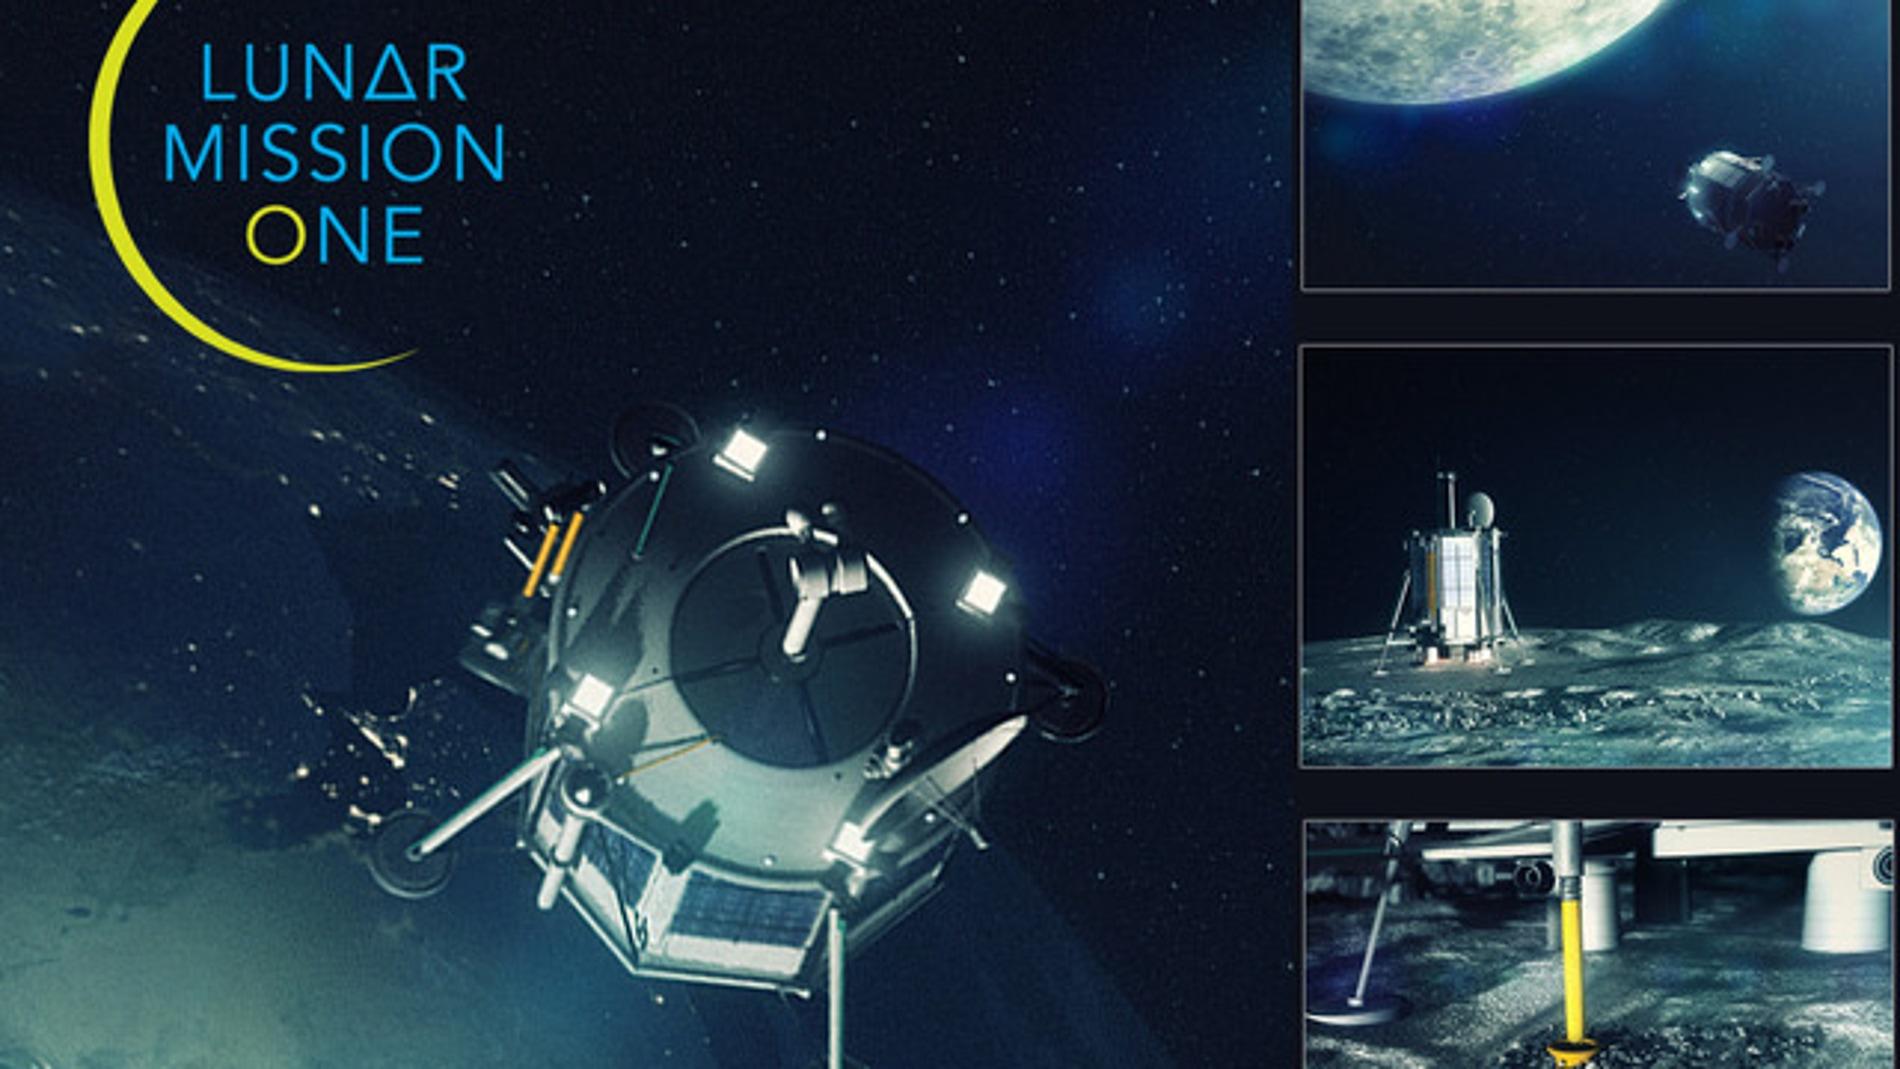 Imagen corporativa de la Lunar Mission One